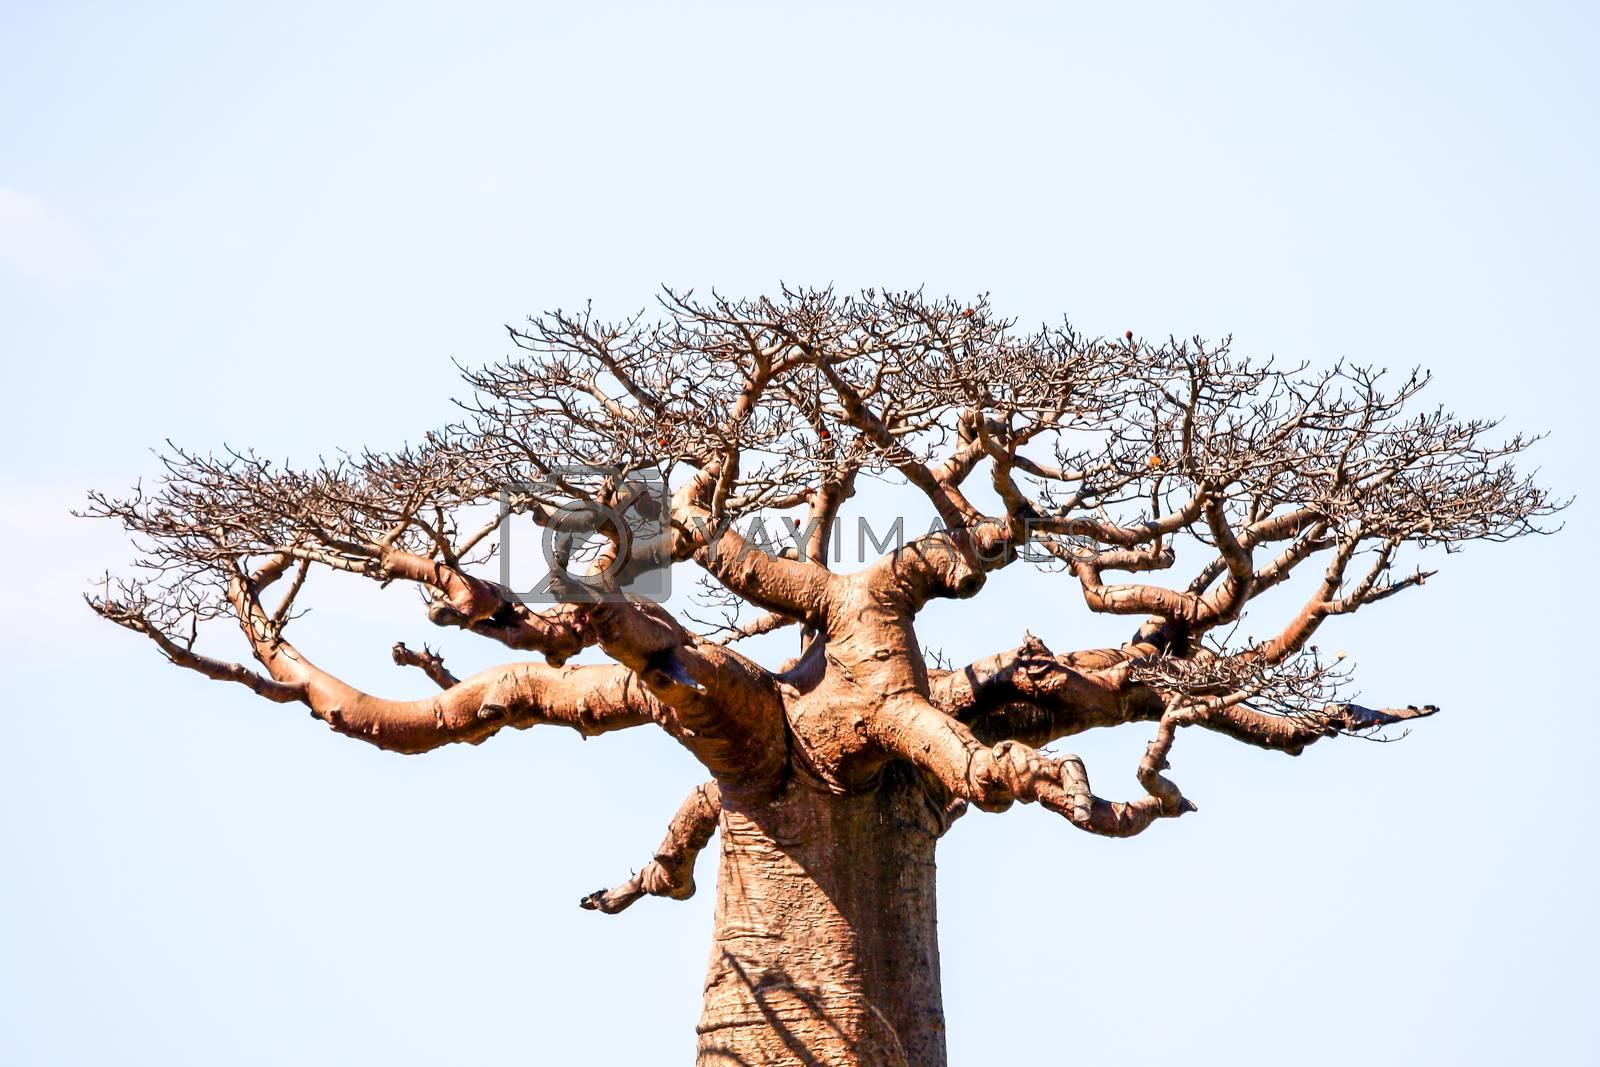 One of the huge baobabs in the Avenida de Baobab in Madagascar